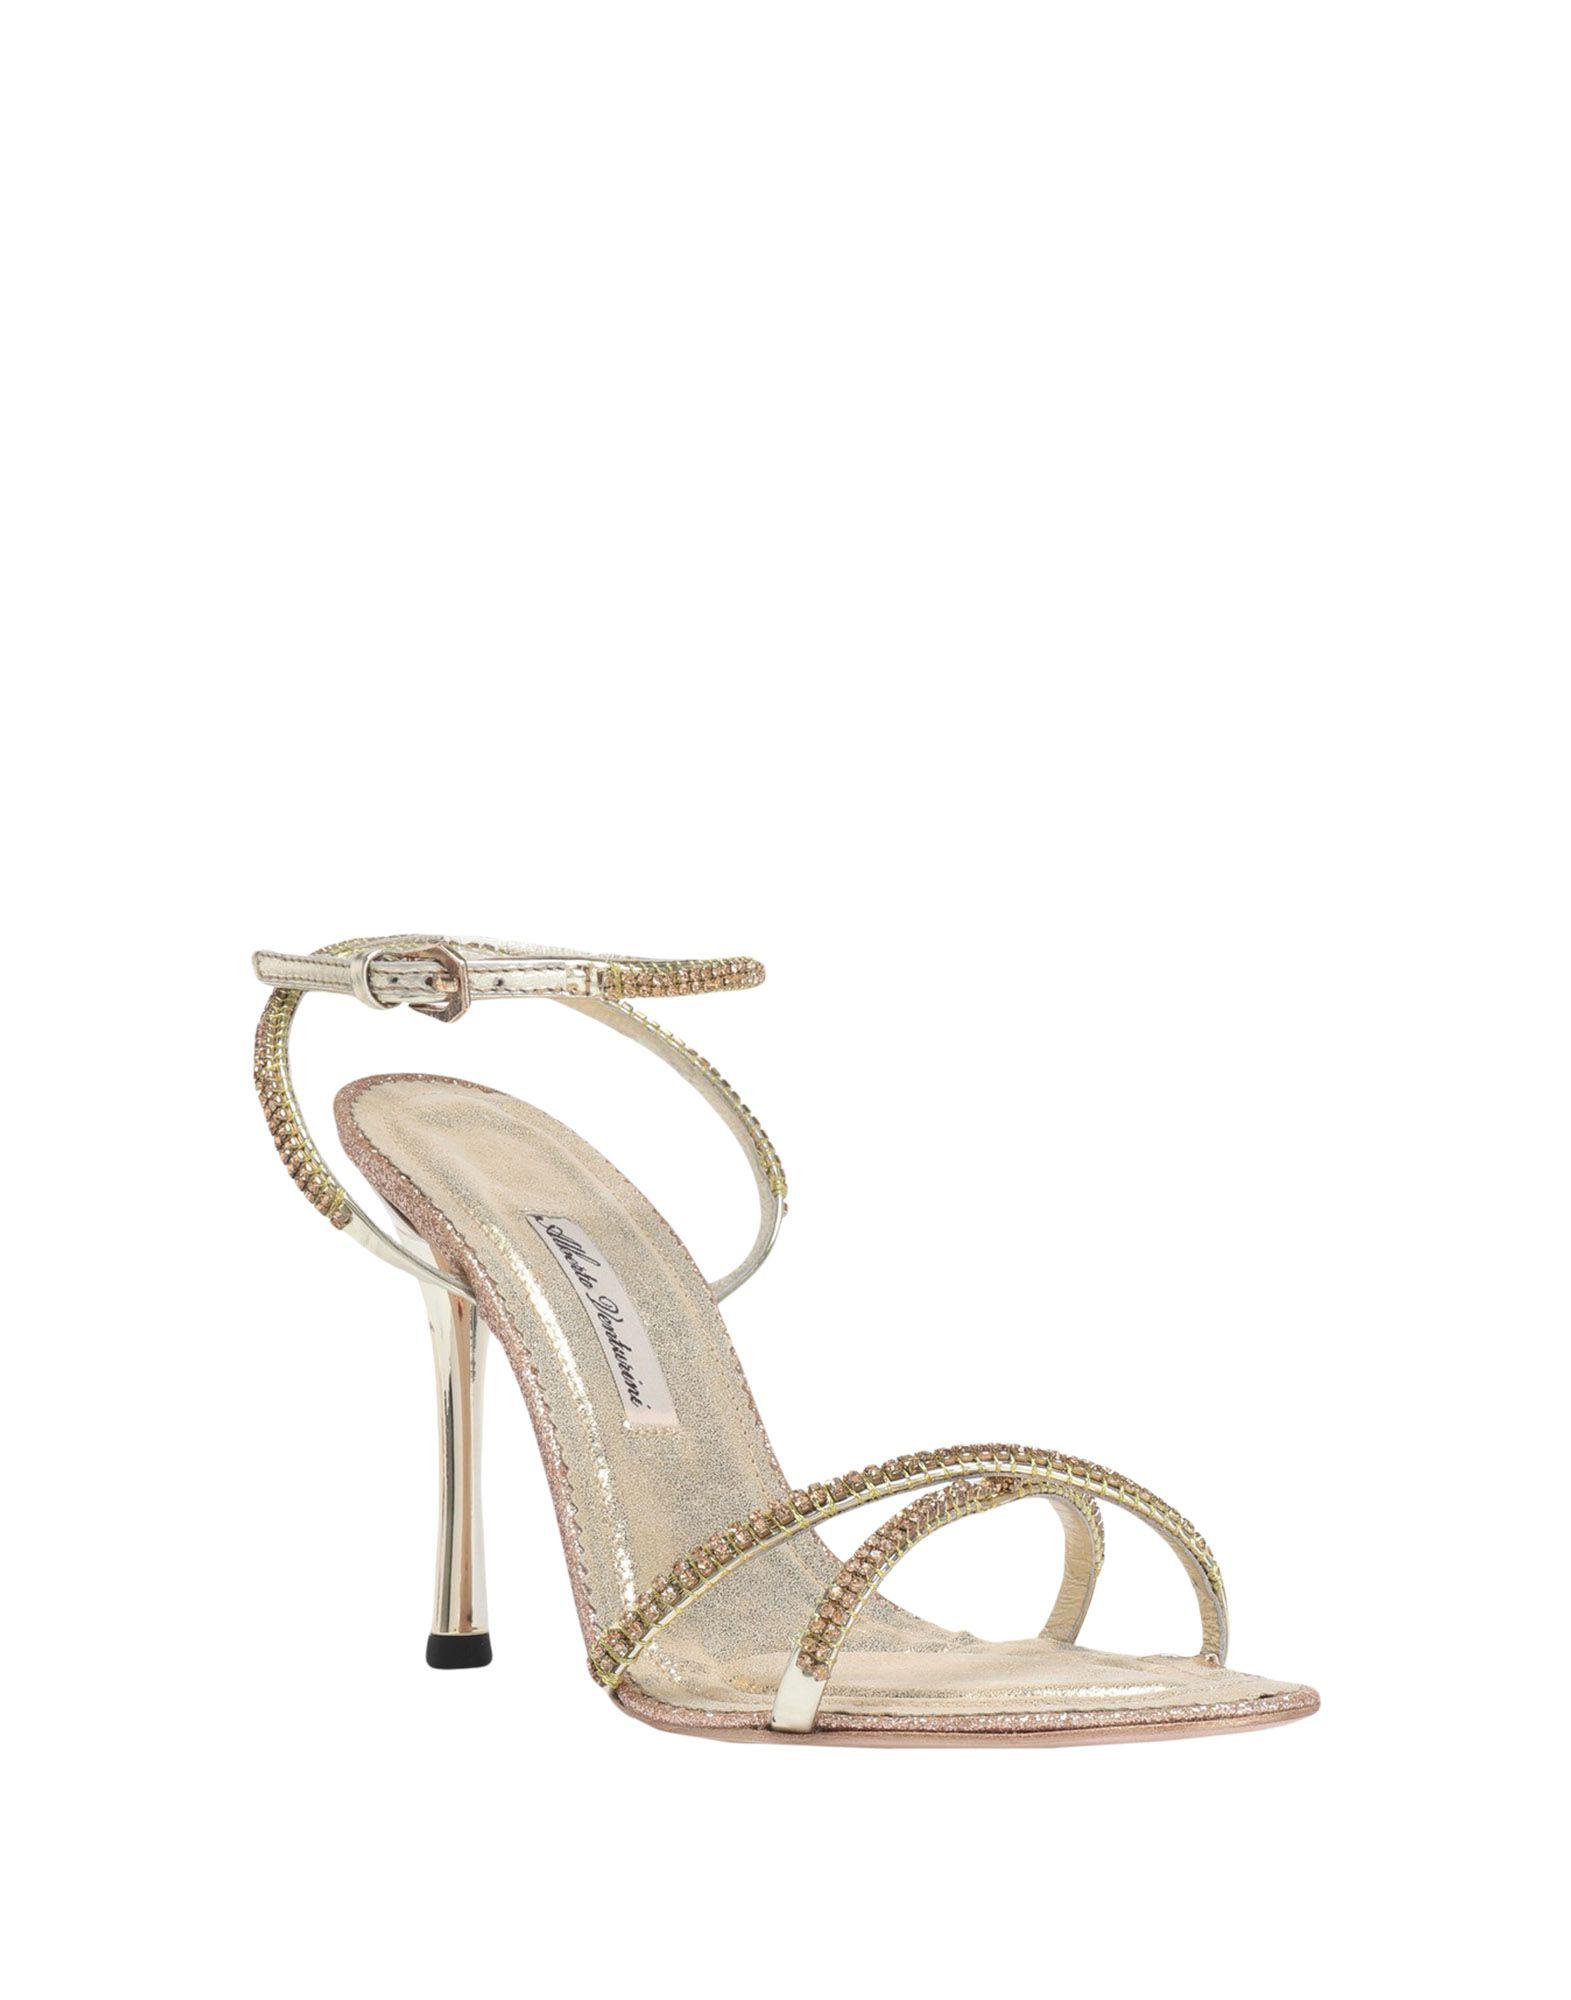 Gut Venturini um billige Schuhe zu tragenAlberto Venturini Gut Sandalen Damen  11485326OP 555012